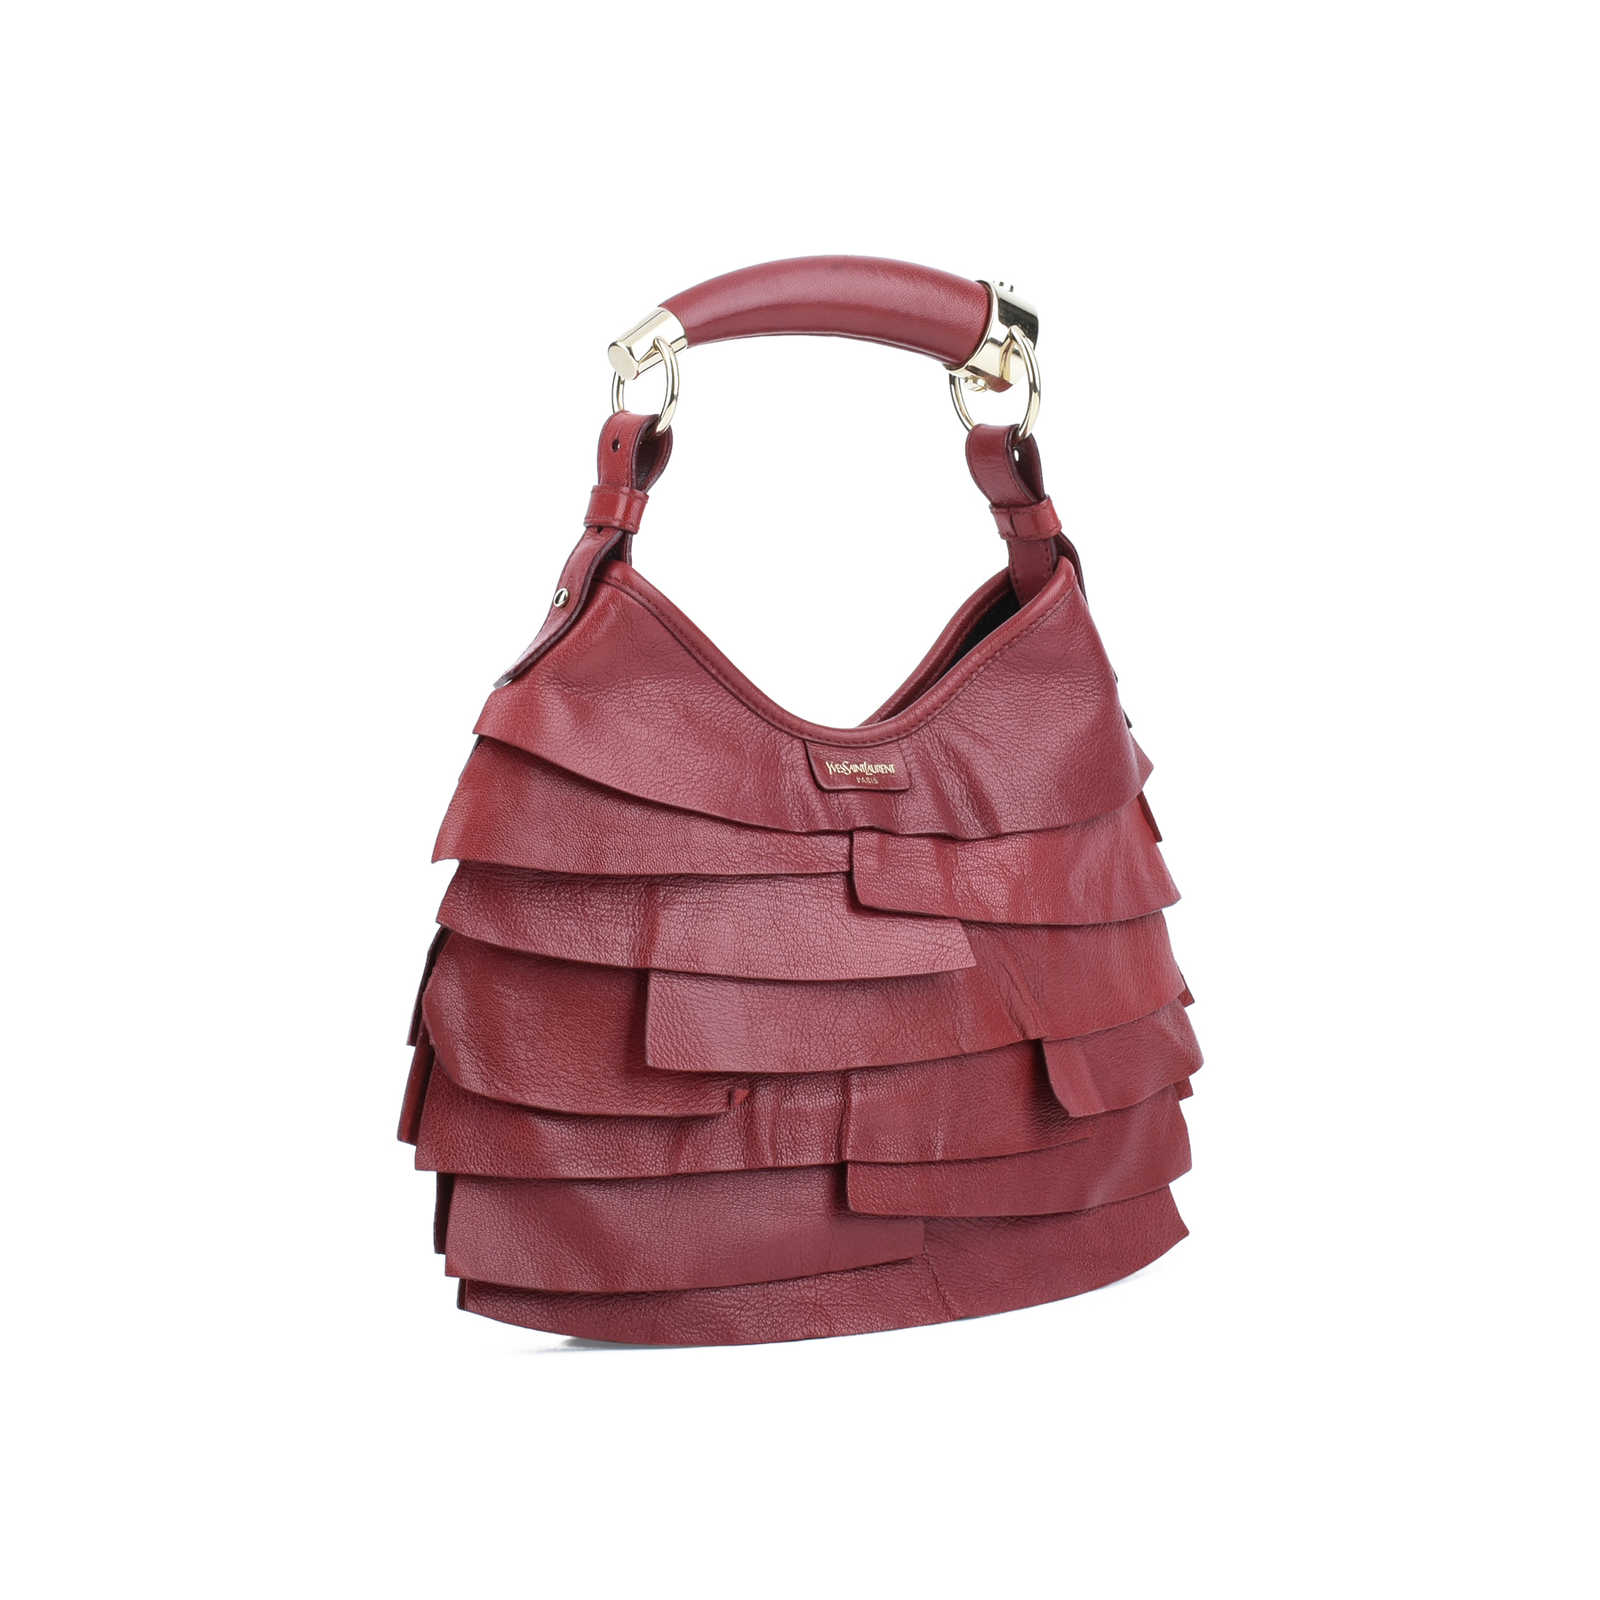 340cb7367b ... Authentic Second Hand Yves Saint Laurent St Tropez Mombasa Bag  (PSS-075-00072 ...